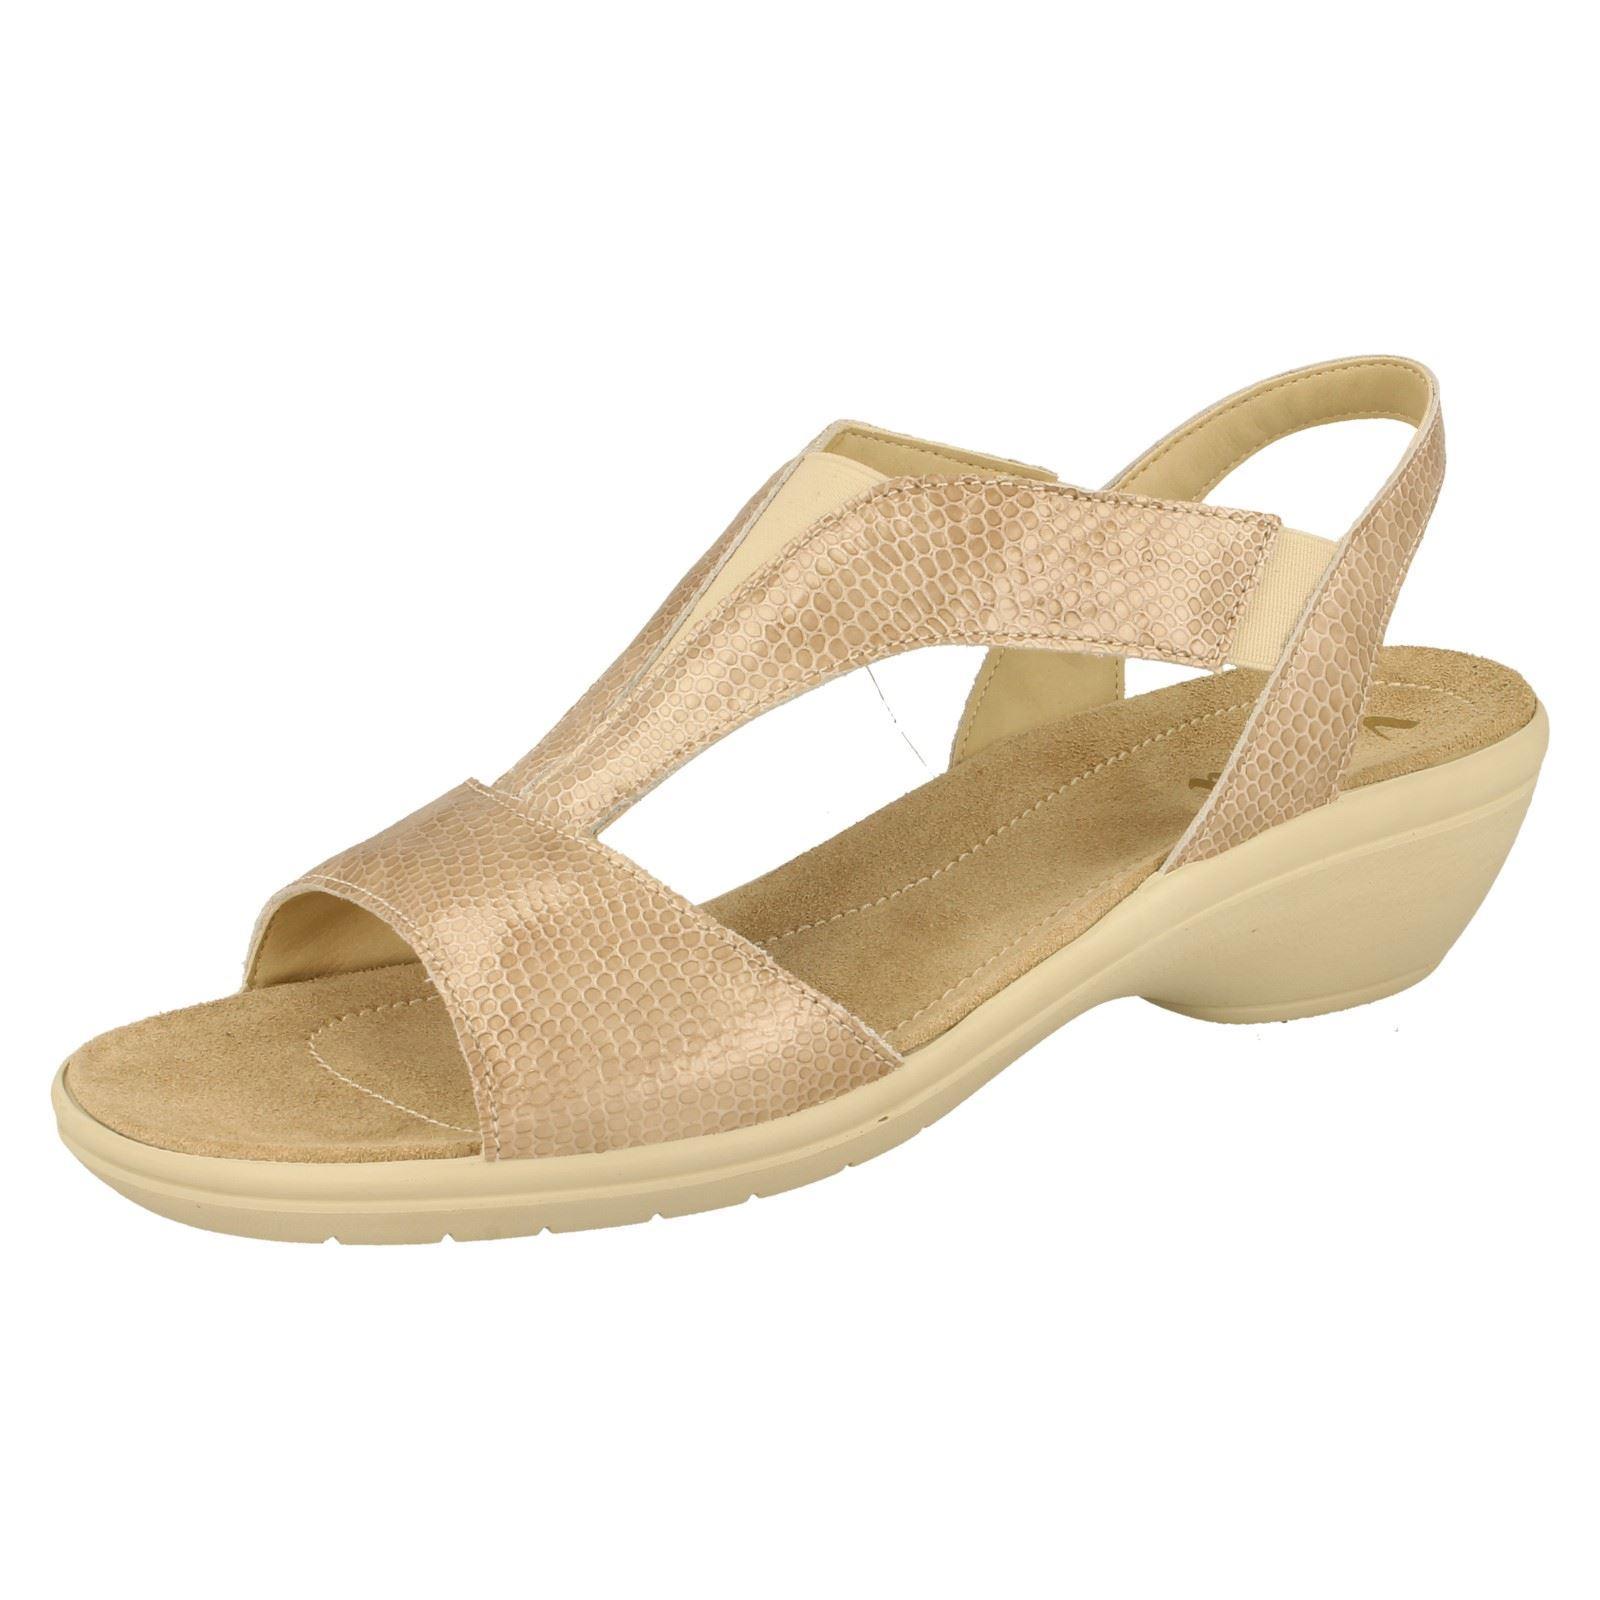 Ladies Van Dal Beige Lizard Patent Sandal Size 7 UK